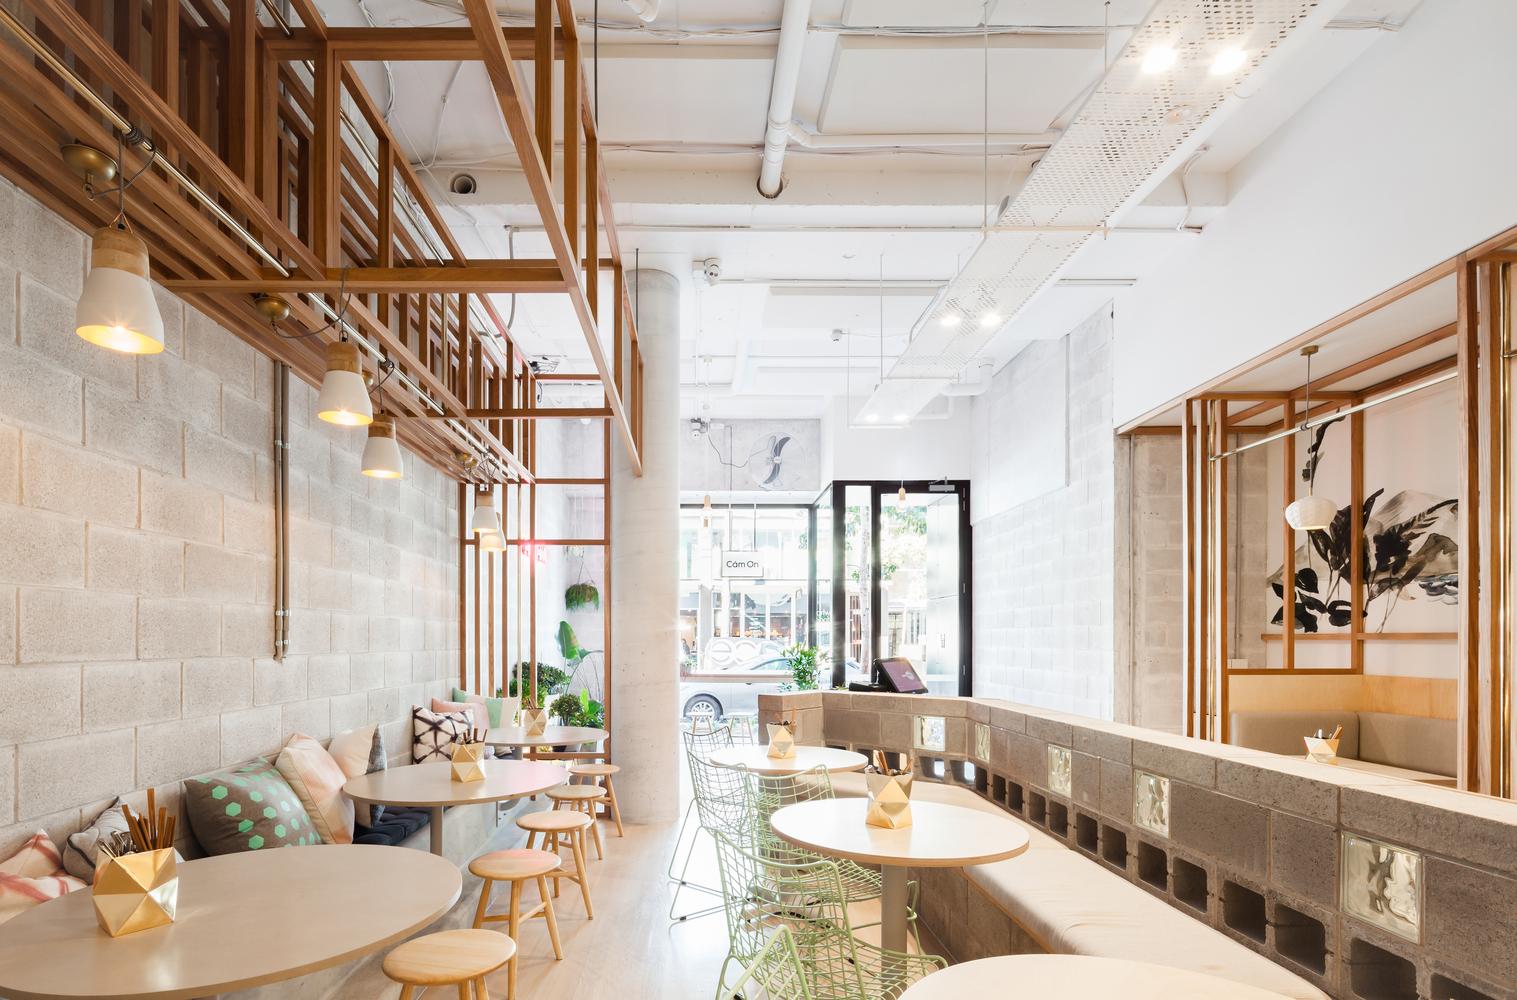 Gallery of 2016 Restaurant & Bar Design Awards Announced - 25